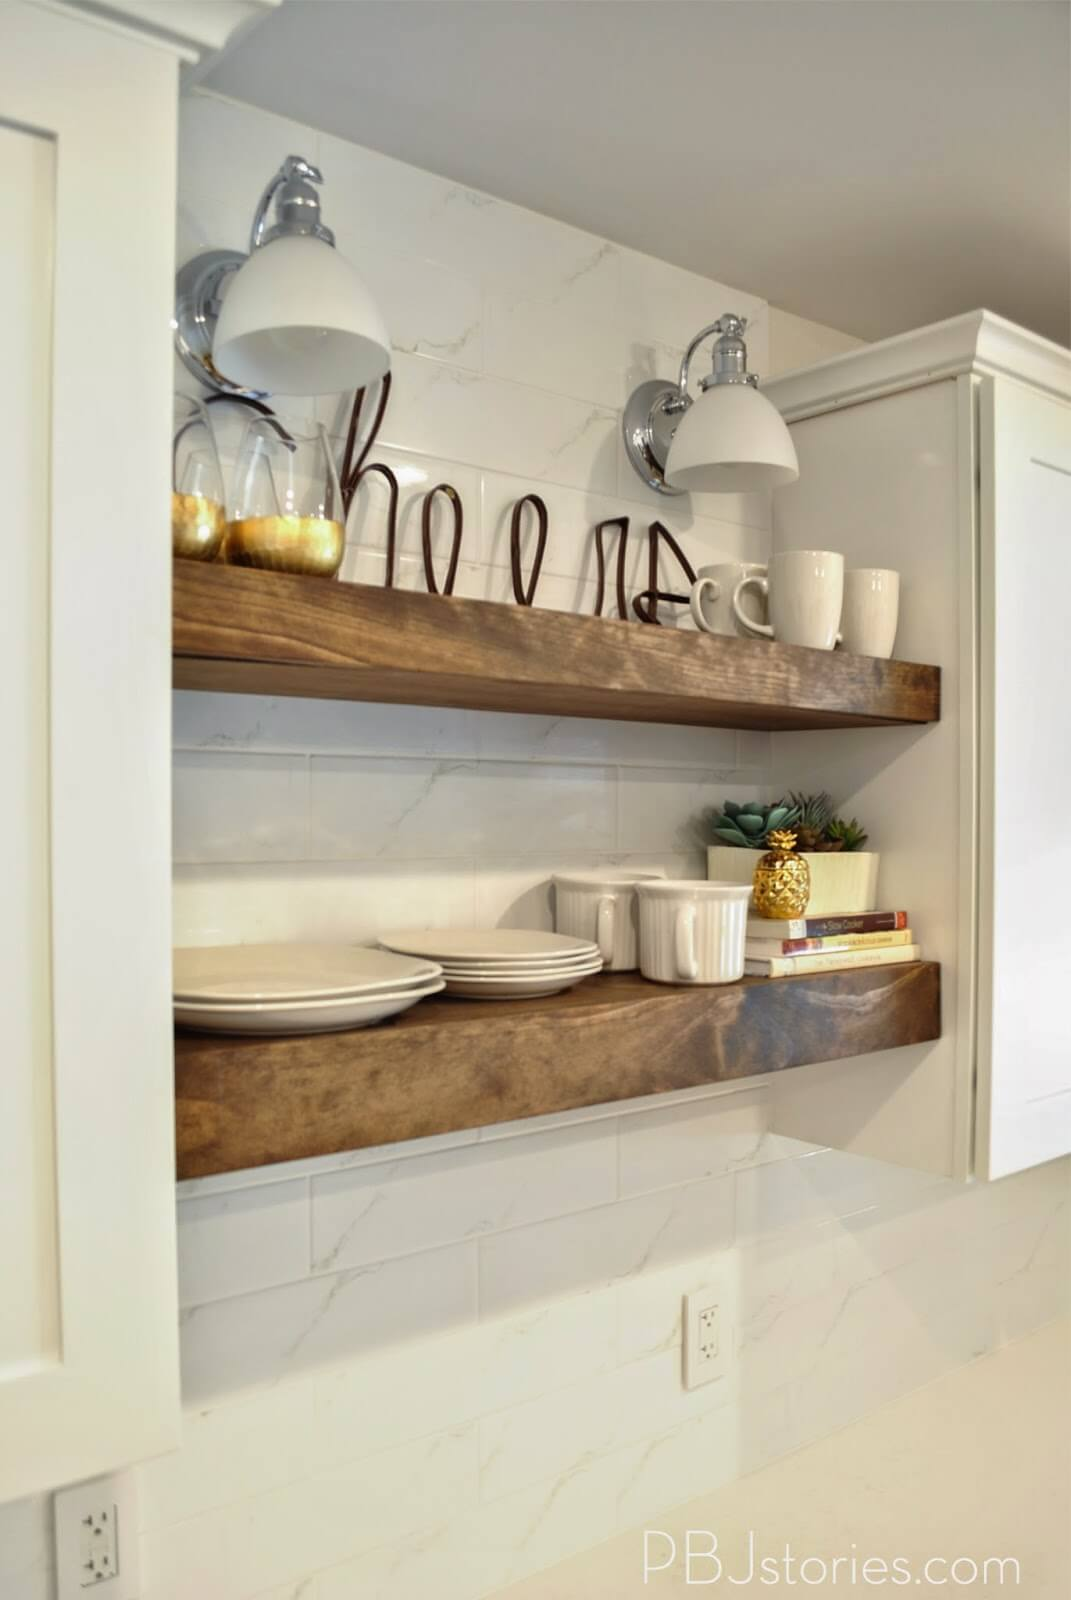 best diy floating shelf ideas and designs for homebnc heavy duty kitchen shelves comfy breakfast nook display easy shoe rack homebase white mini island ikea wire wall shelving